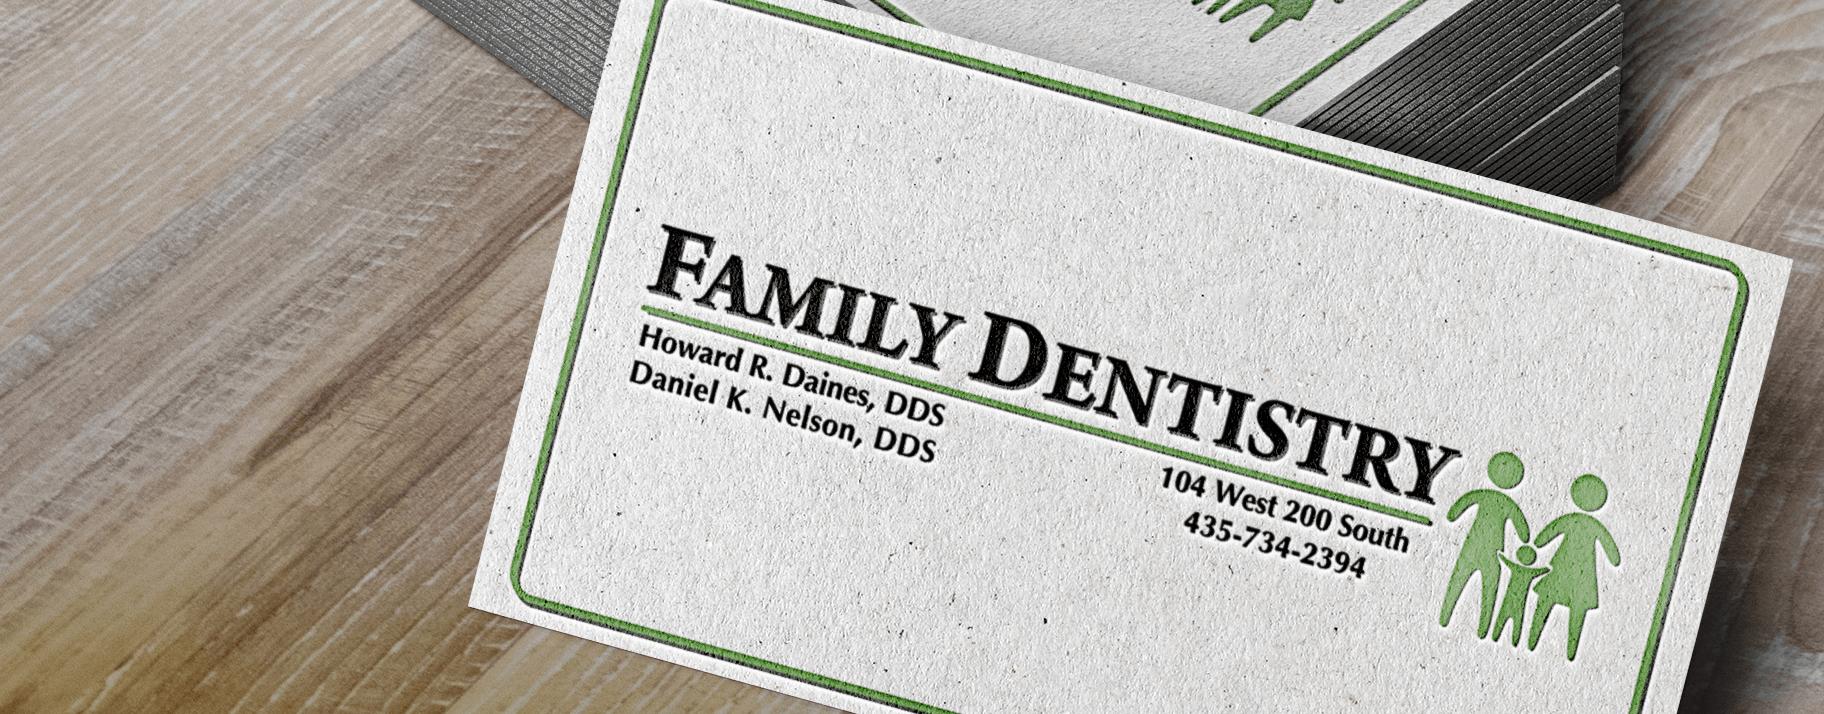 familydentistrybusinesscardsmockup-e1521610907534.png